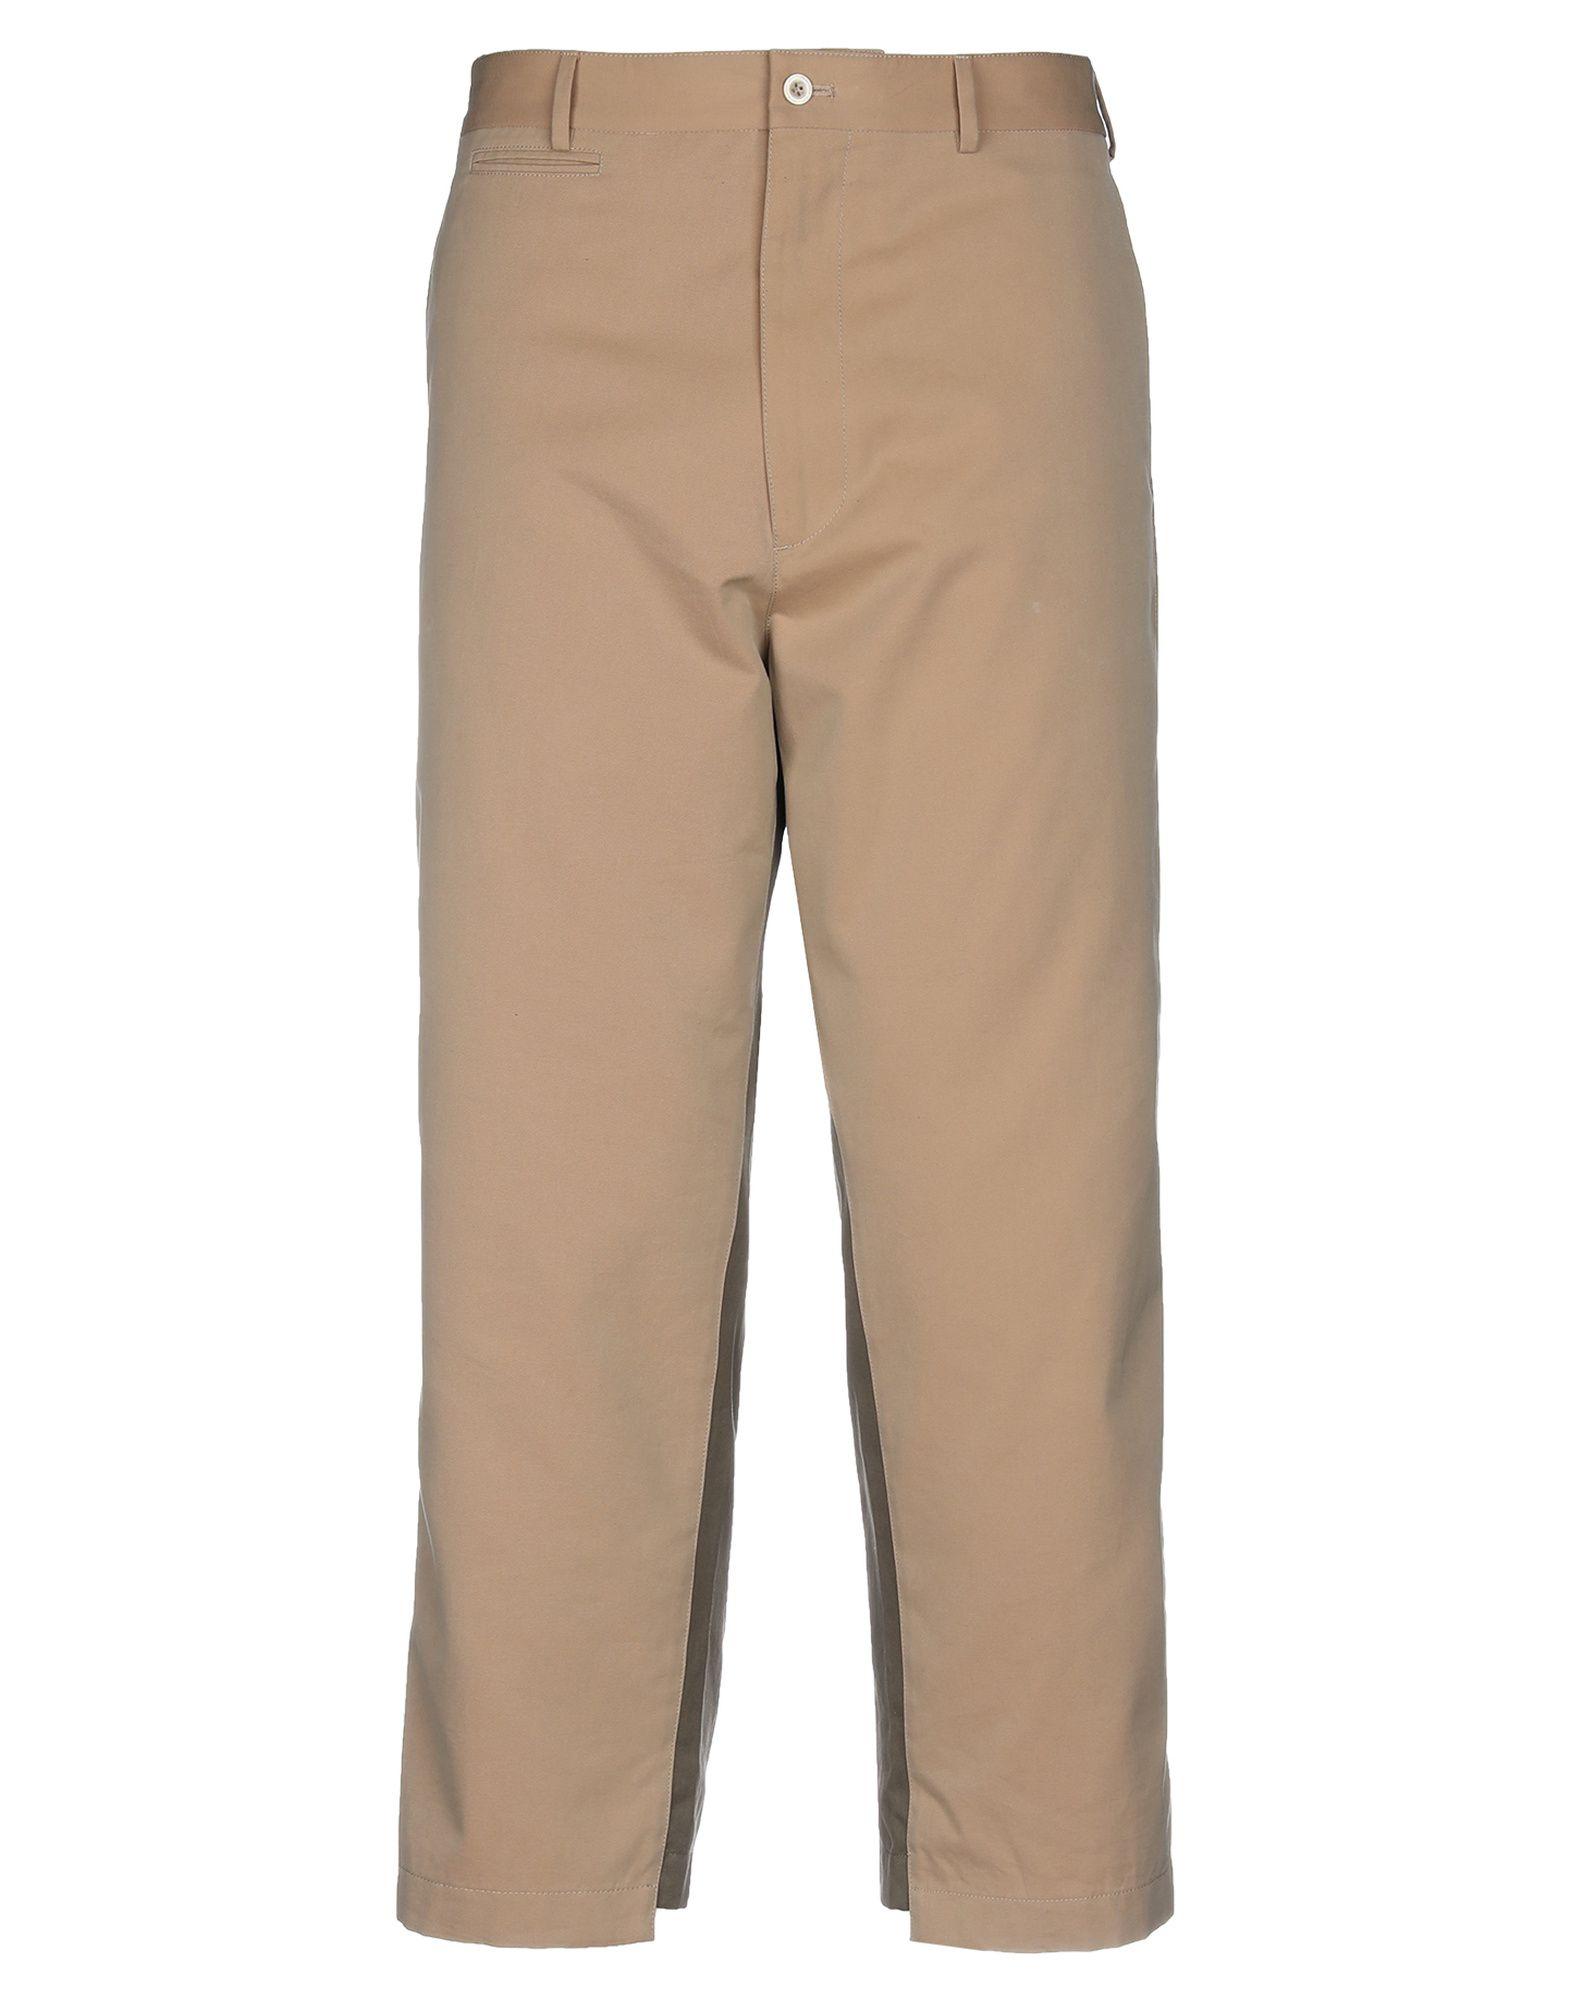 8a5e00c31c Pantaloni uomo: pantaloni formali, cargo, pantaloncini e bermuda | YOOX